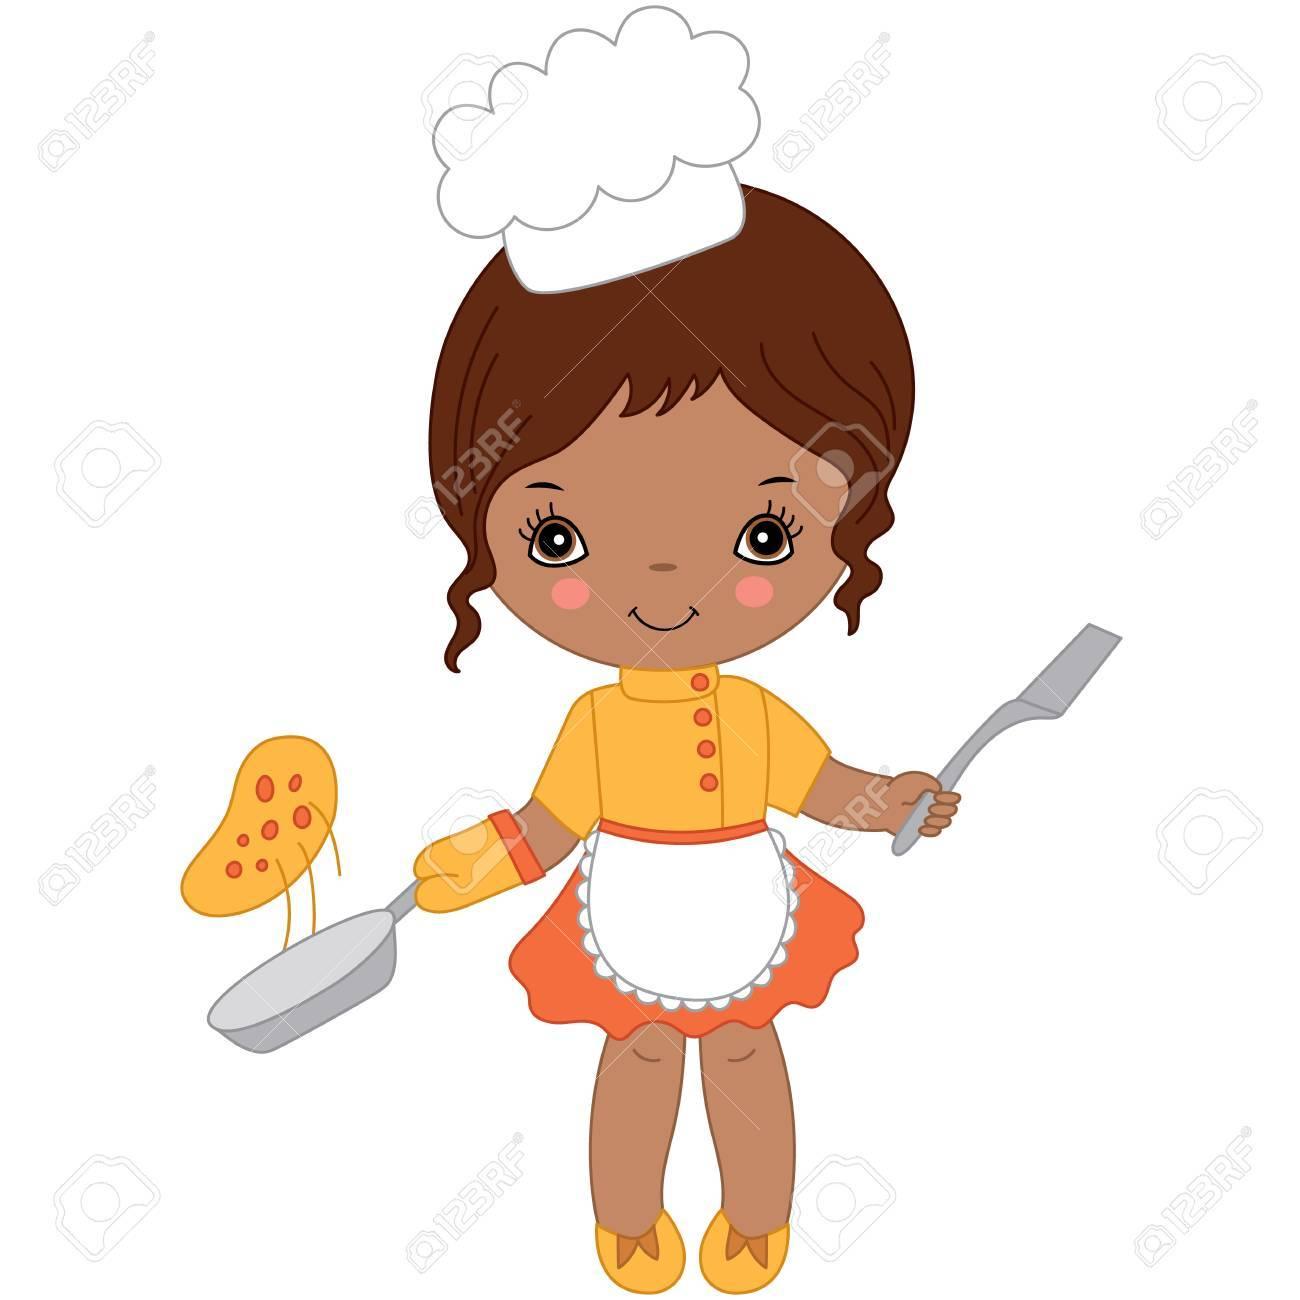 Girl chef clipart 1 » Clipart Portal.